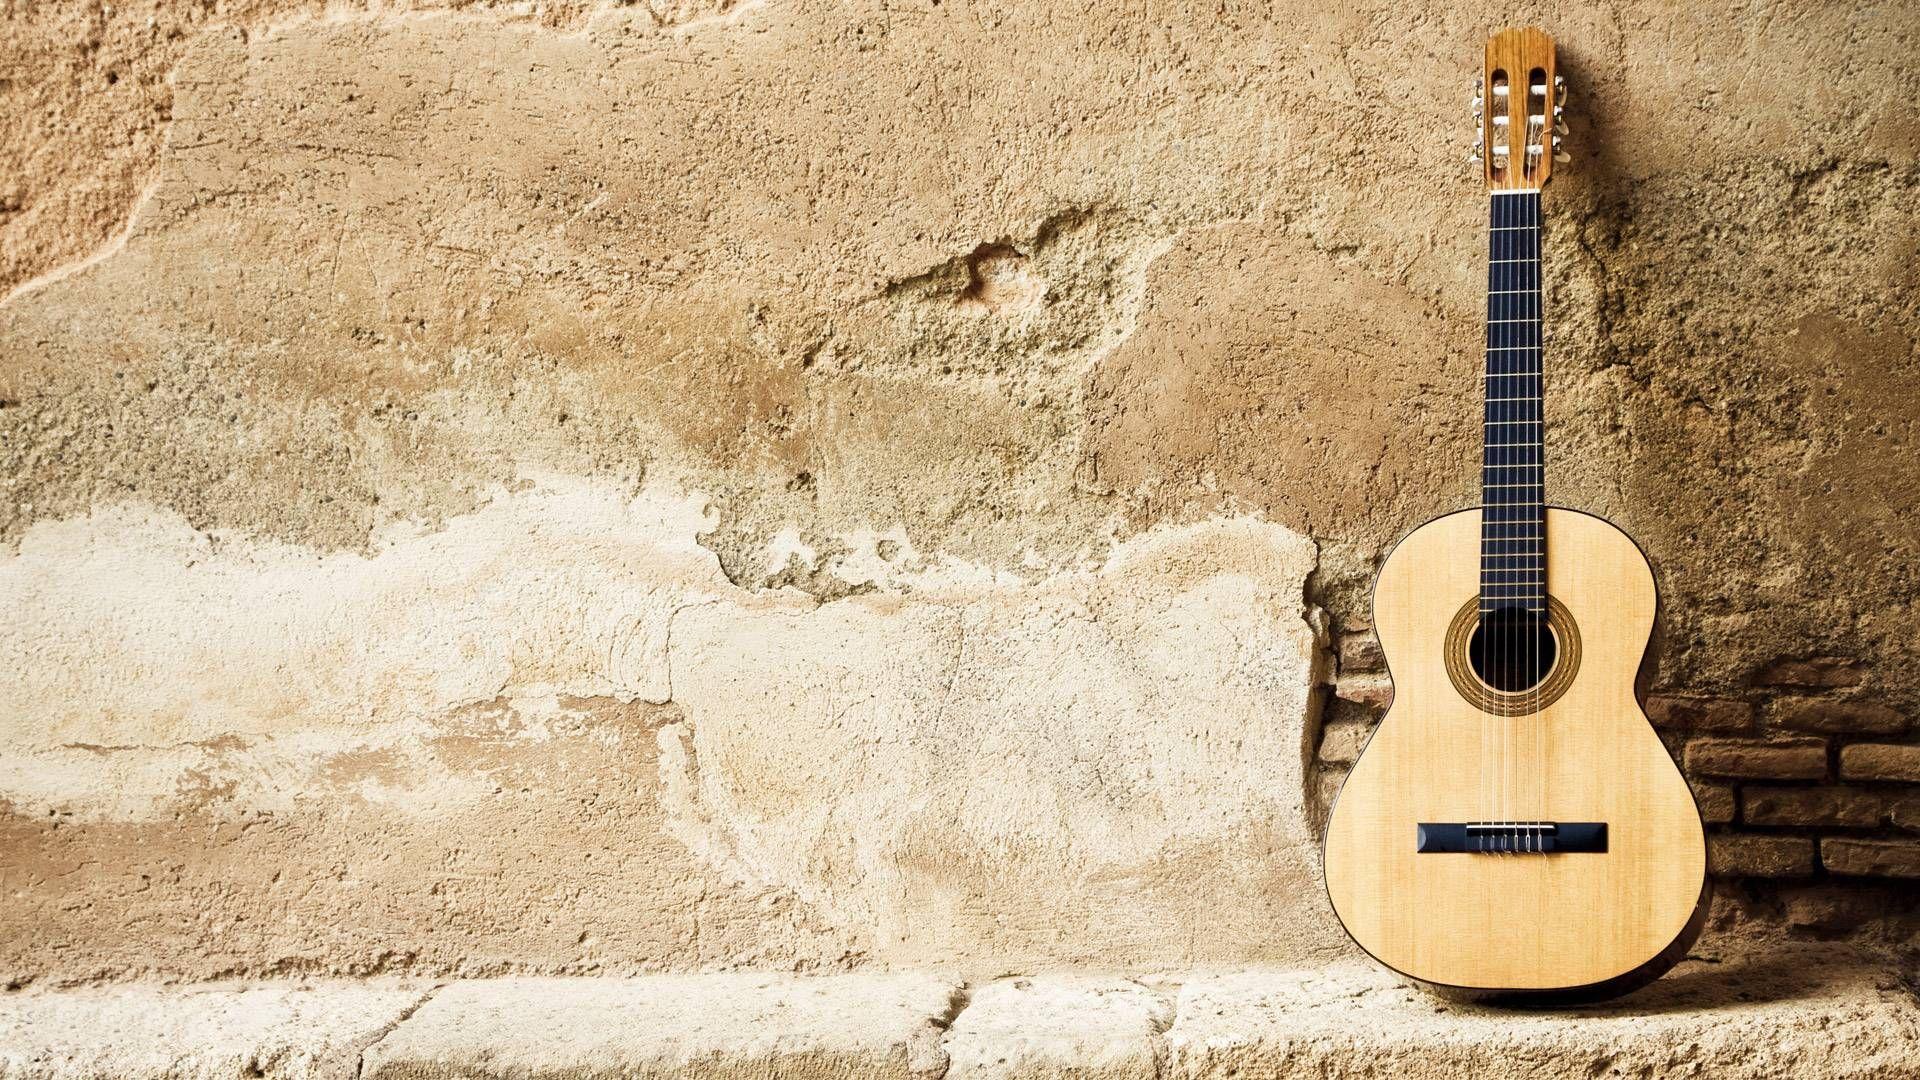 Acoustic Guitar High Definition Wallpaper Music Wallpaper Acoustic Guitar Guitar Lessons Fingerpicking Guitar